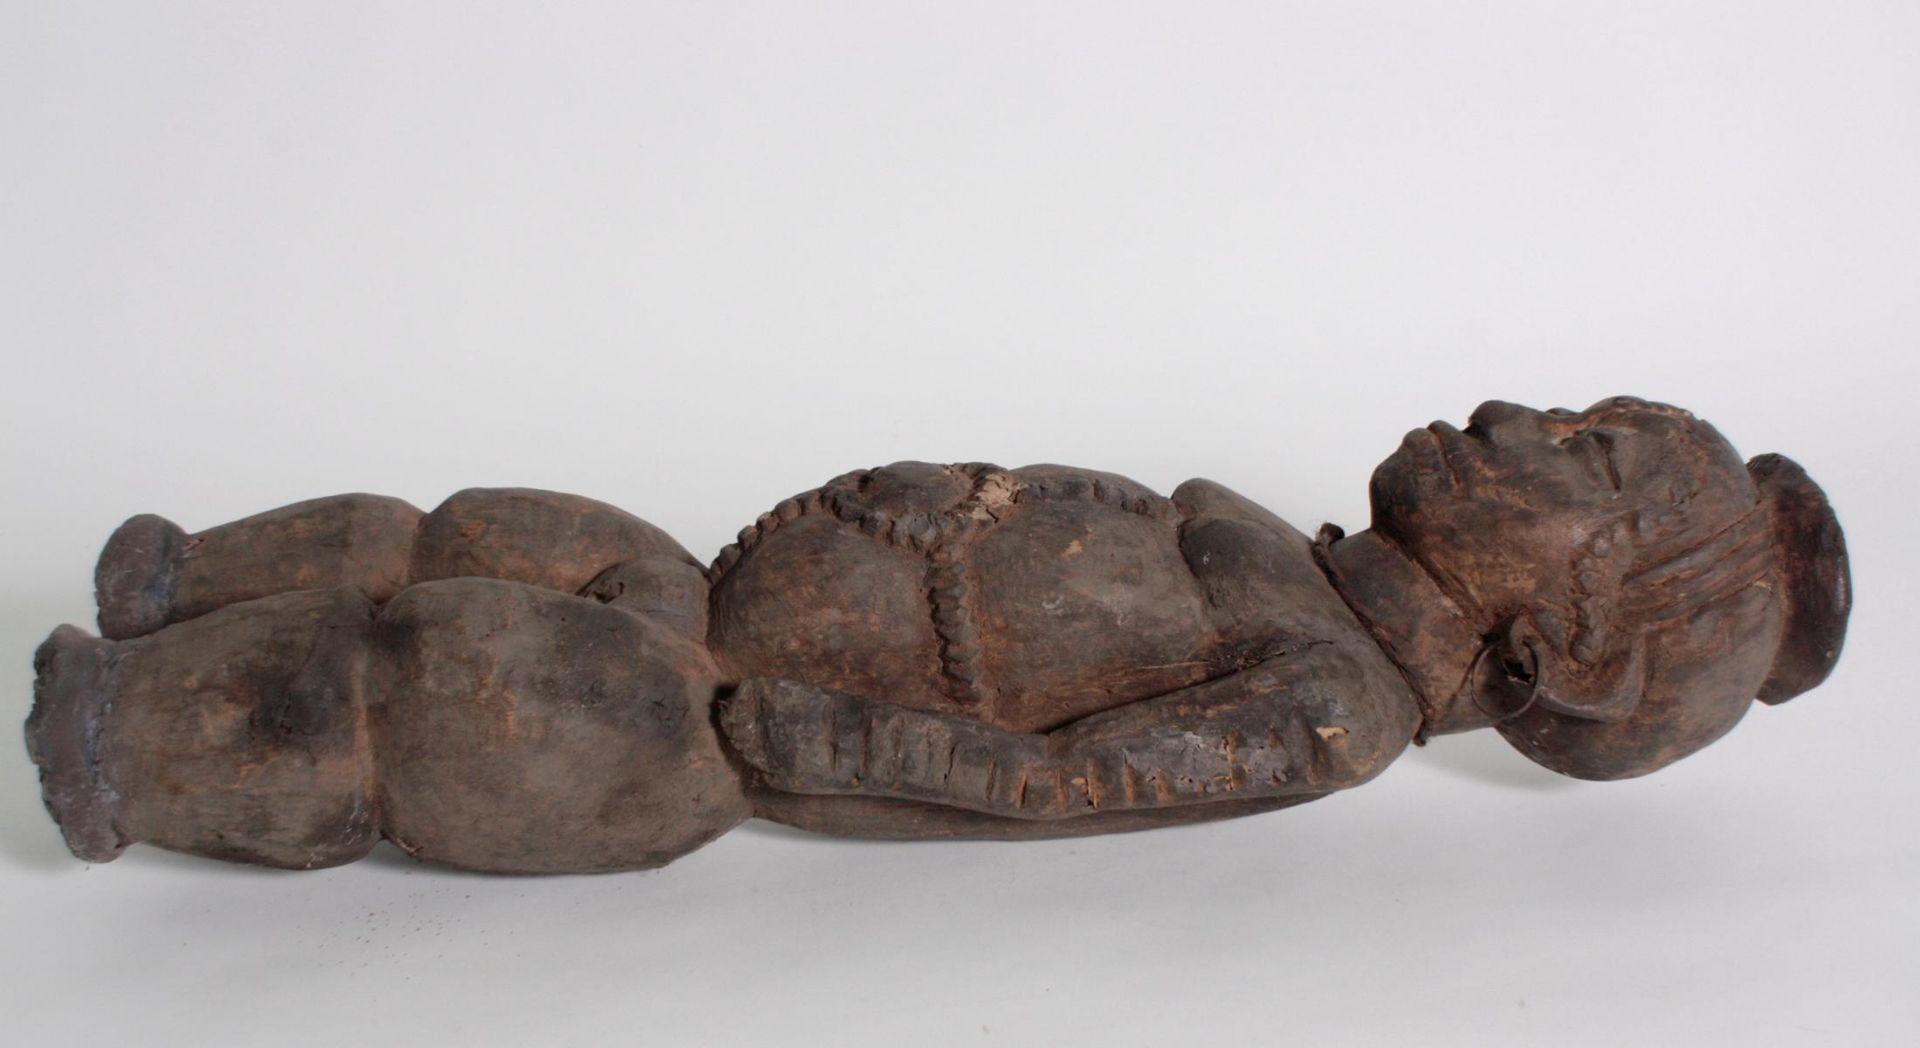 Ältere Ahnen-Figur, Tabwa, D. R. Kongo - Bild 7 aus 14